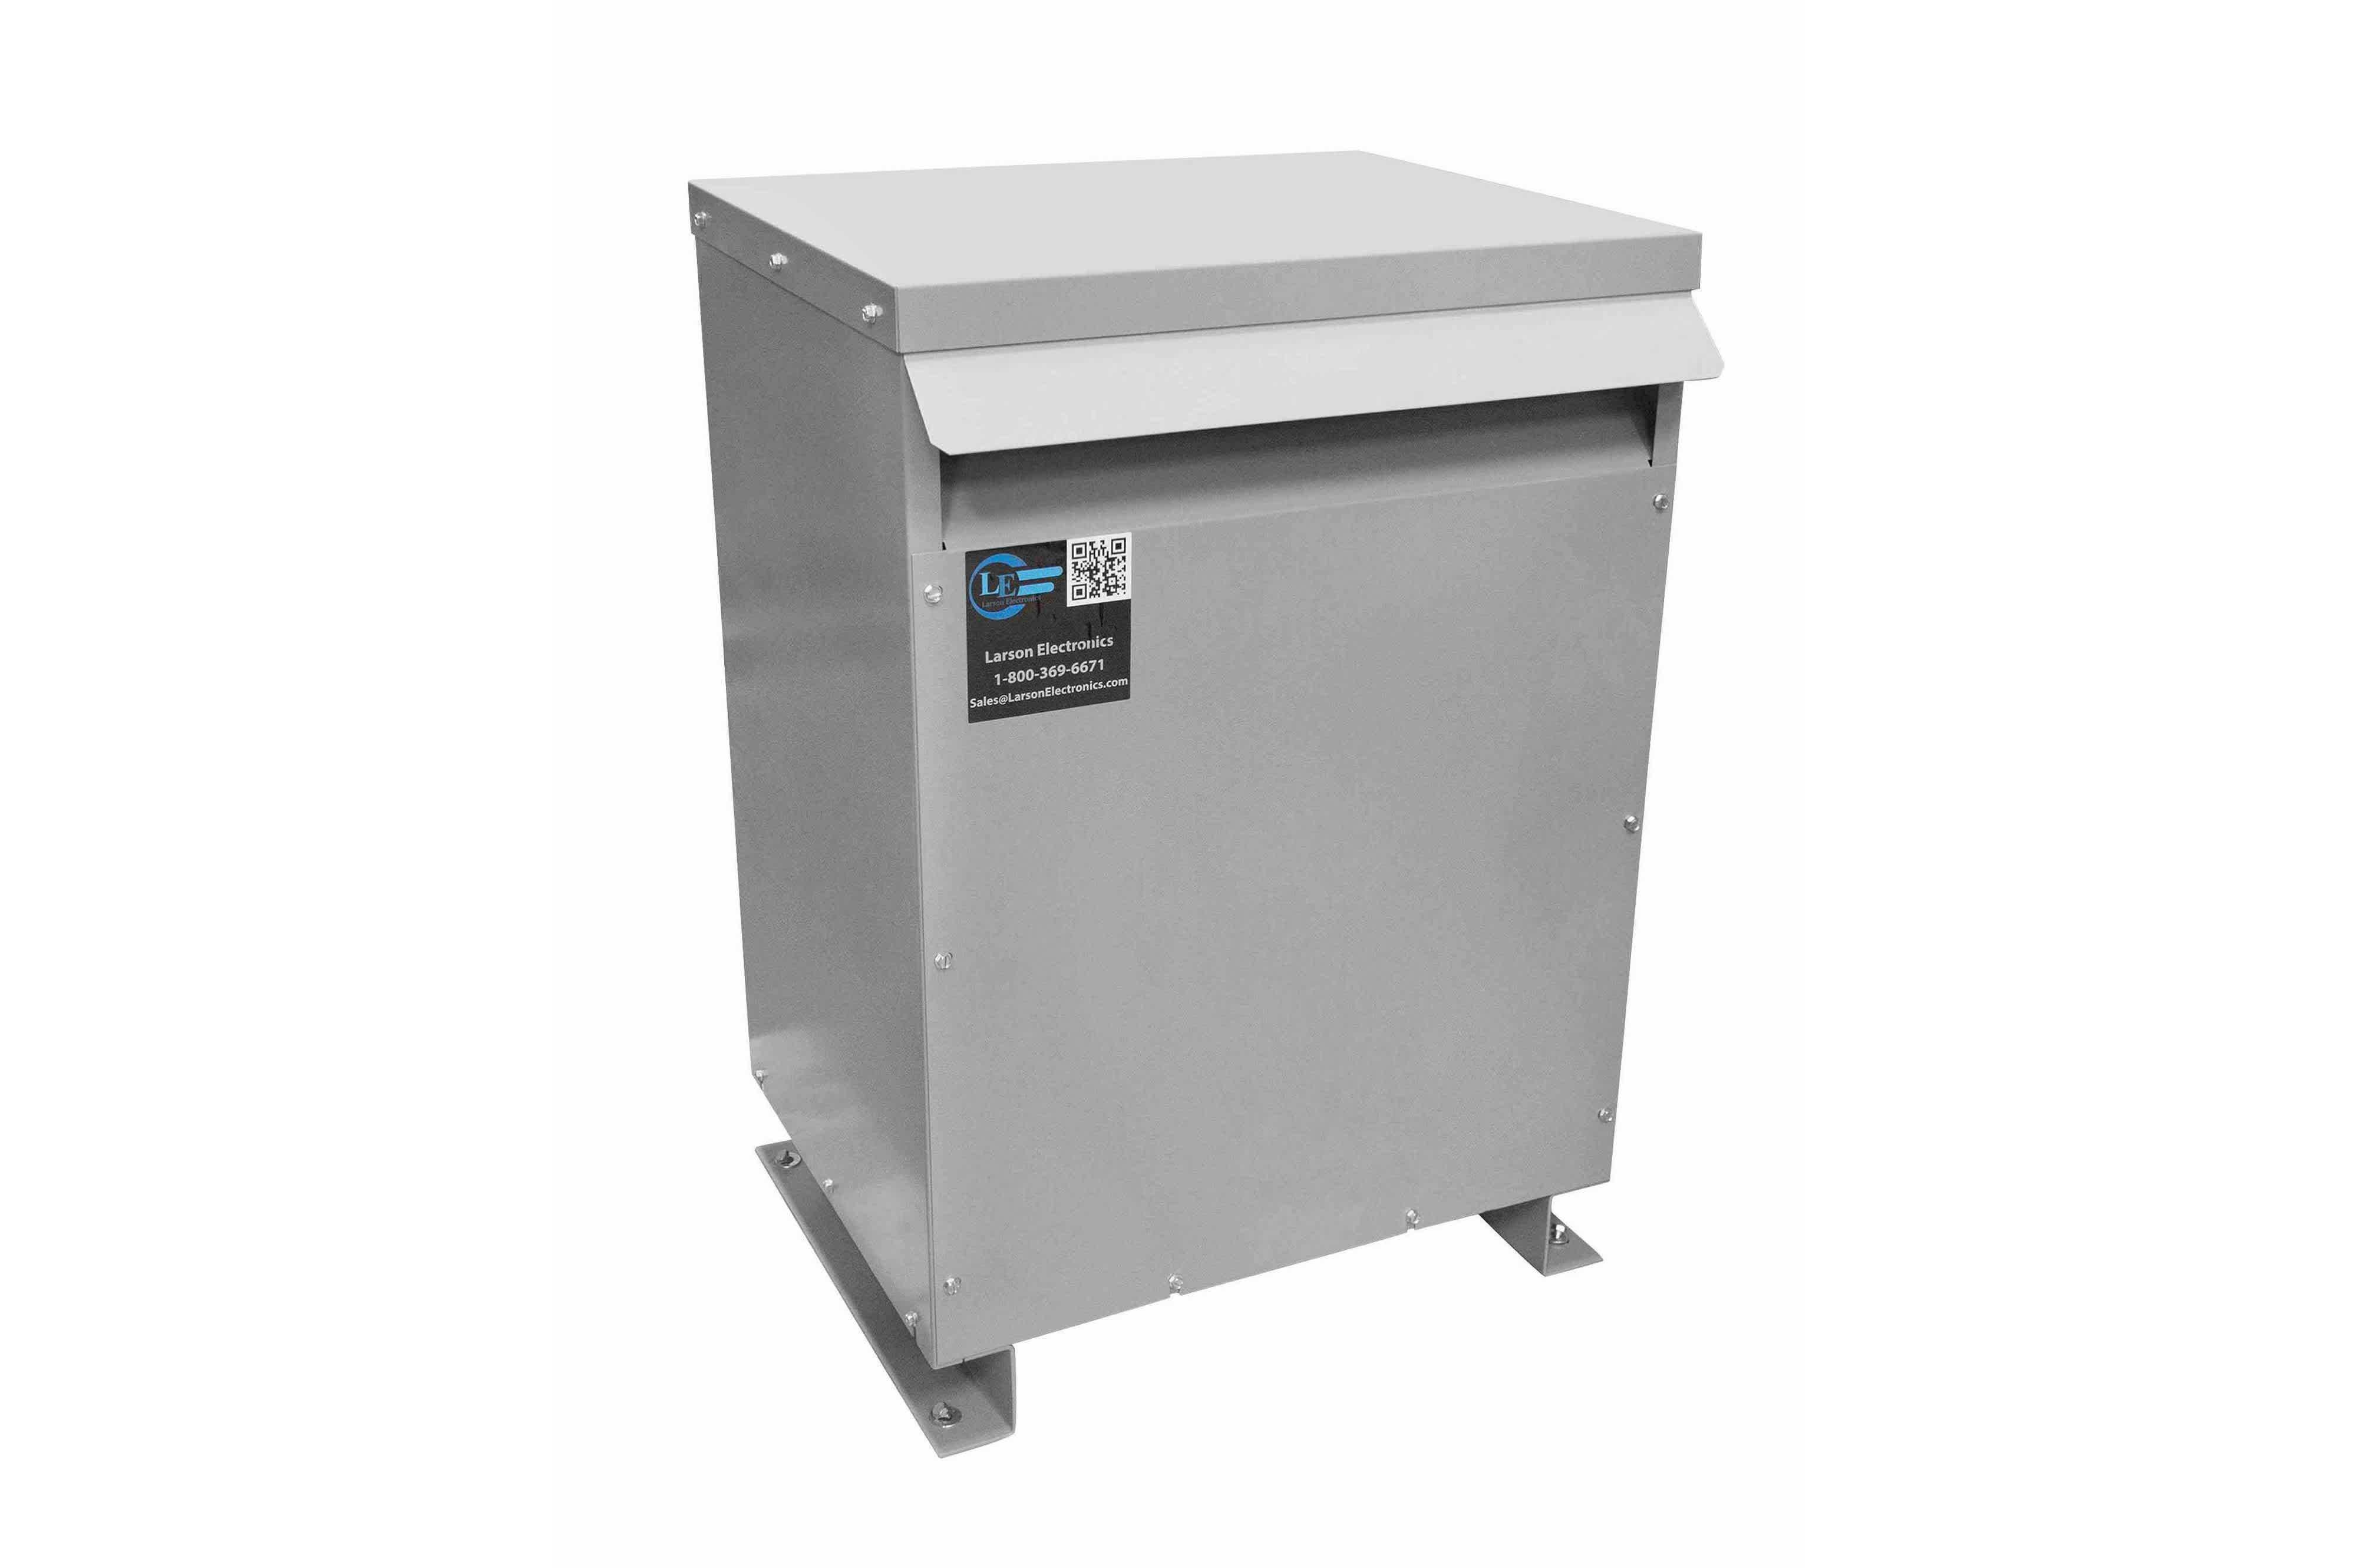 150 kVA 3PH Isolation Transformer, 460V Wye Primary, 208Y/120 Wye-N Secondary, N3R, Ventilated, 60 Hz